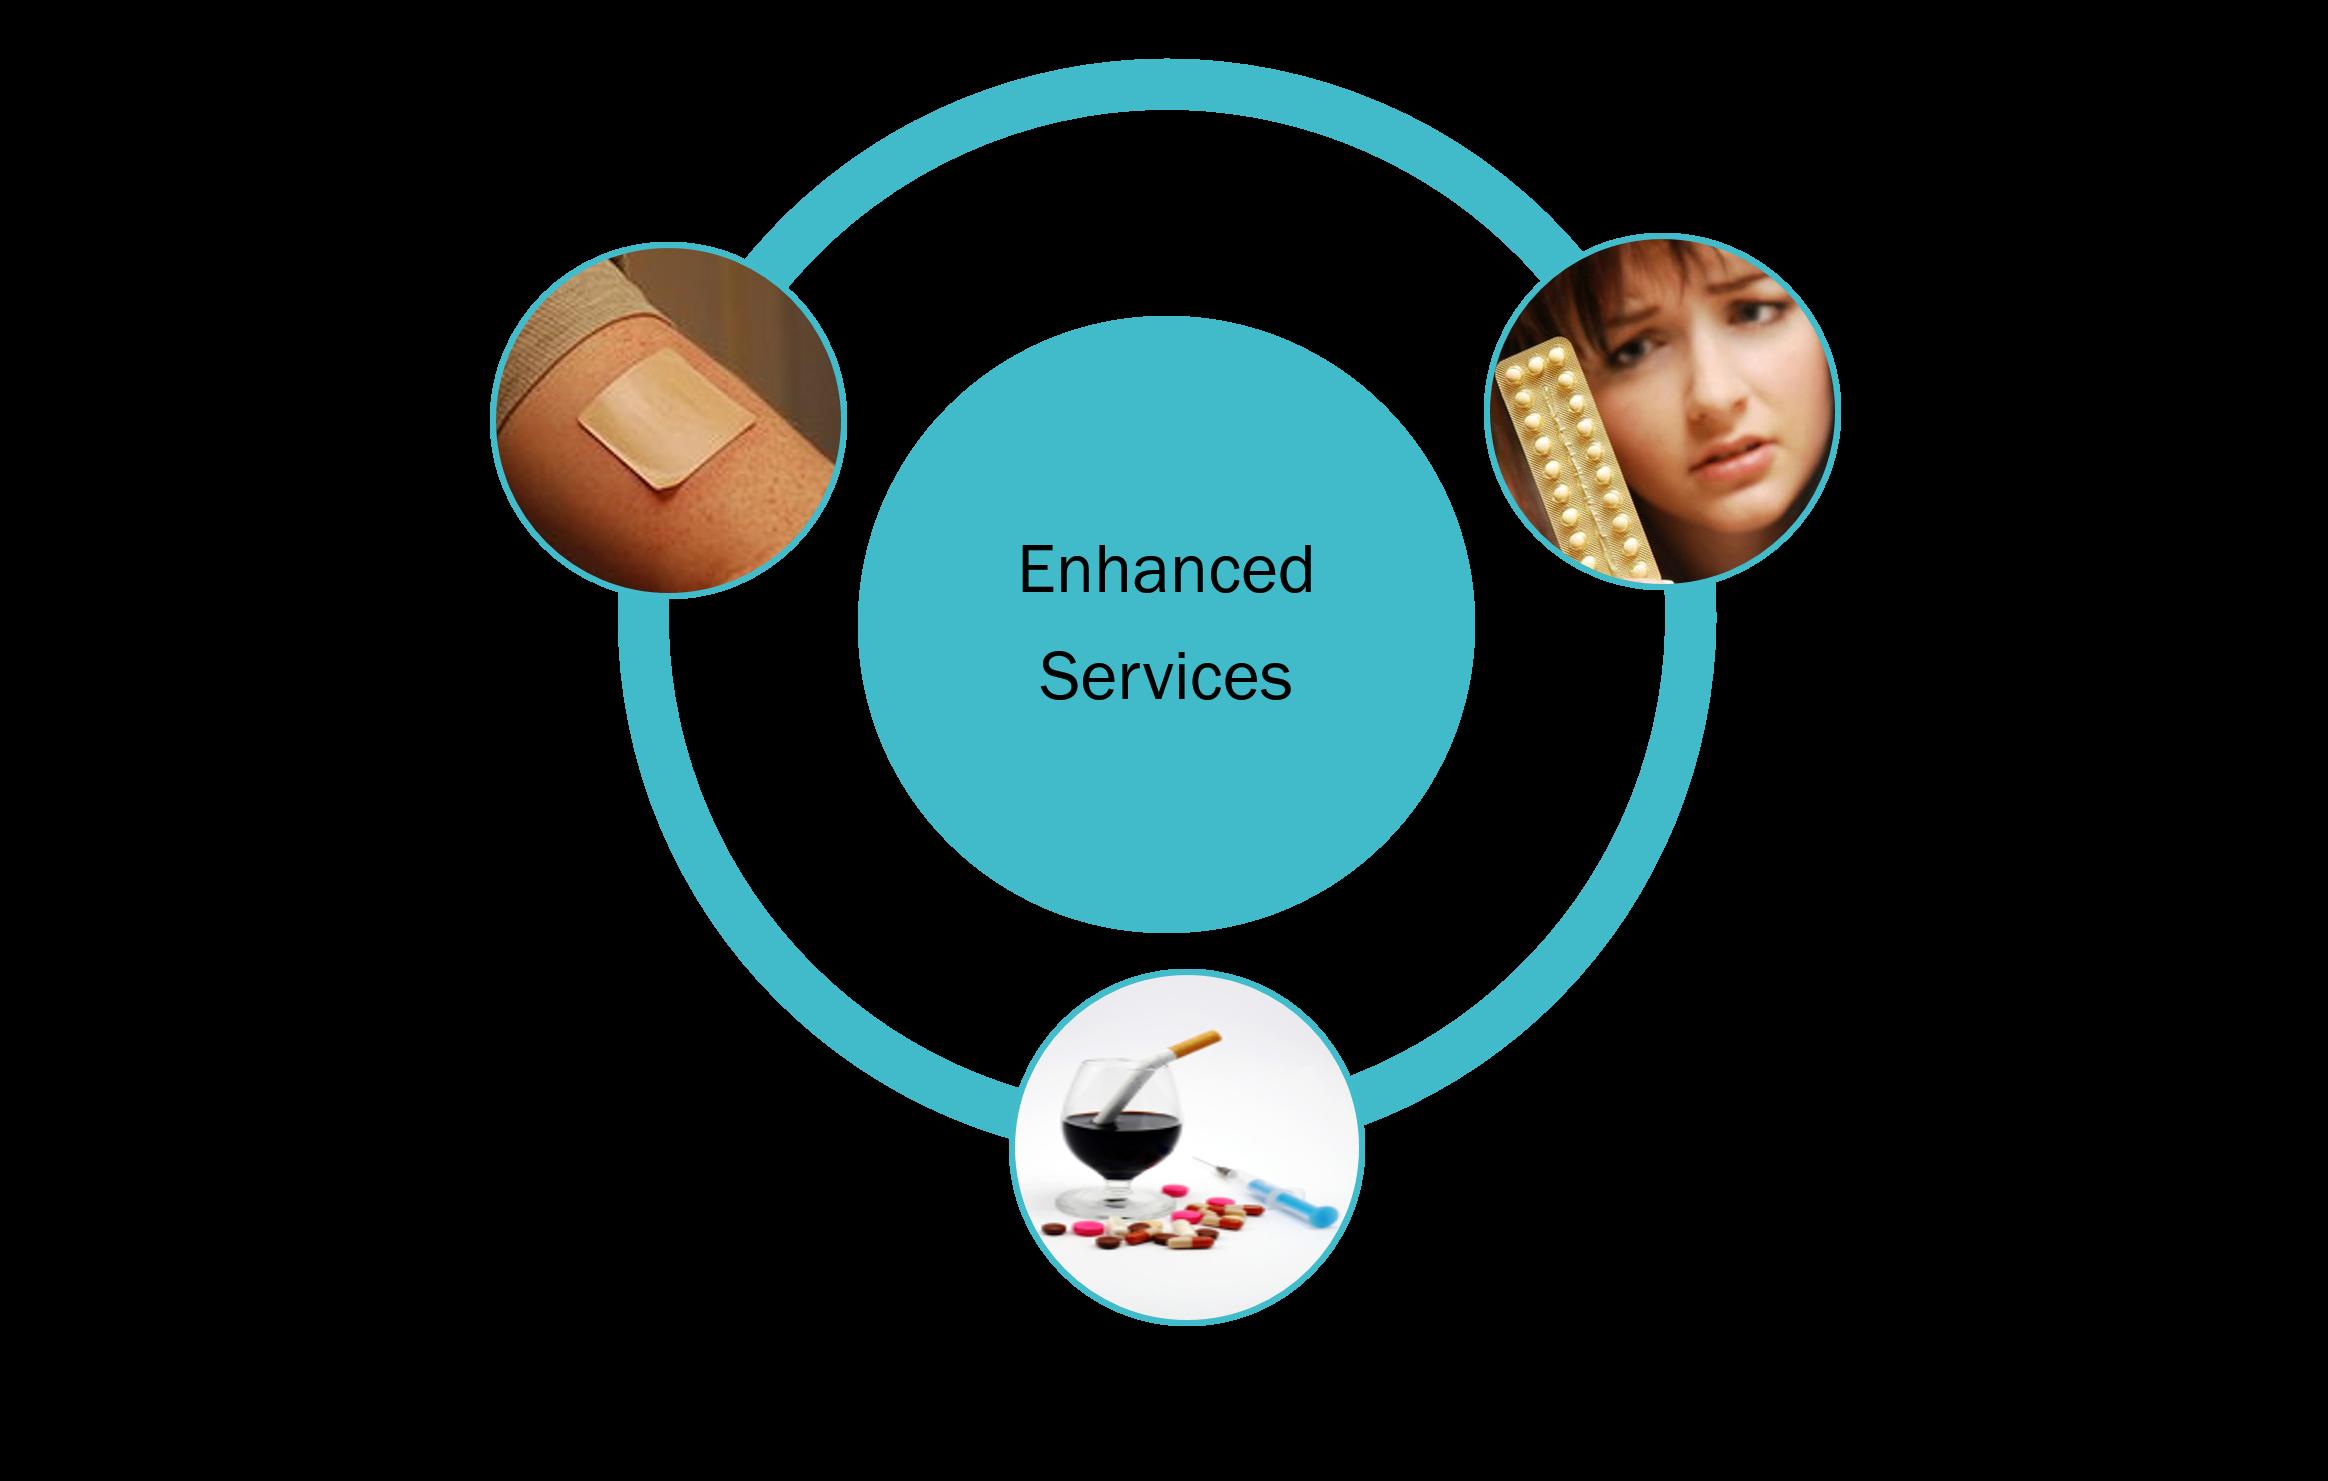 Enhanced Services diagram